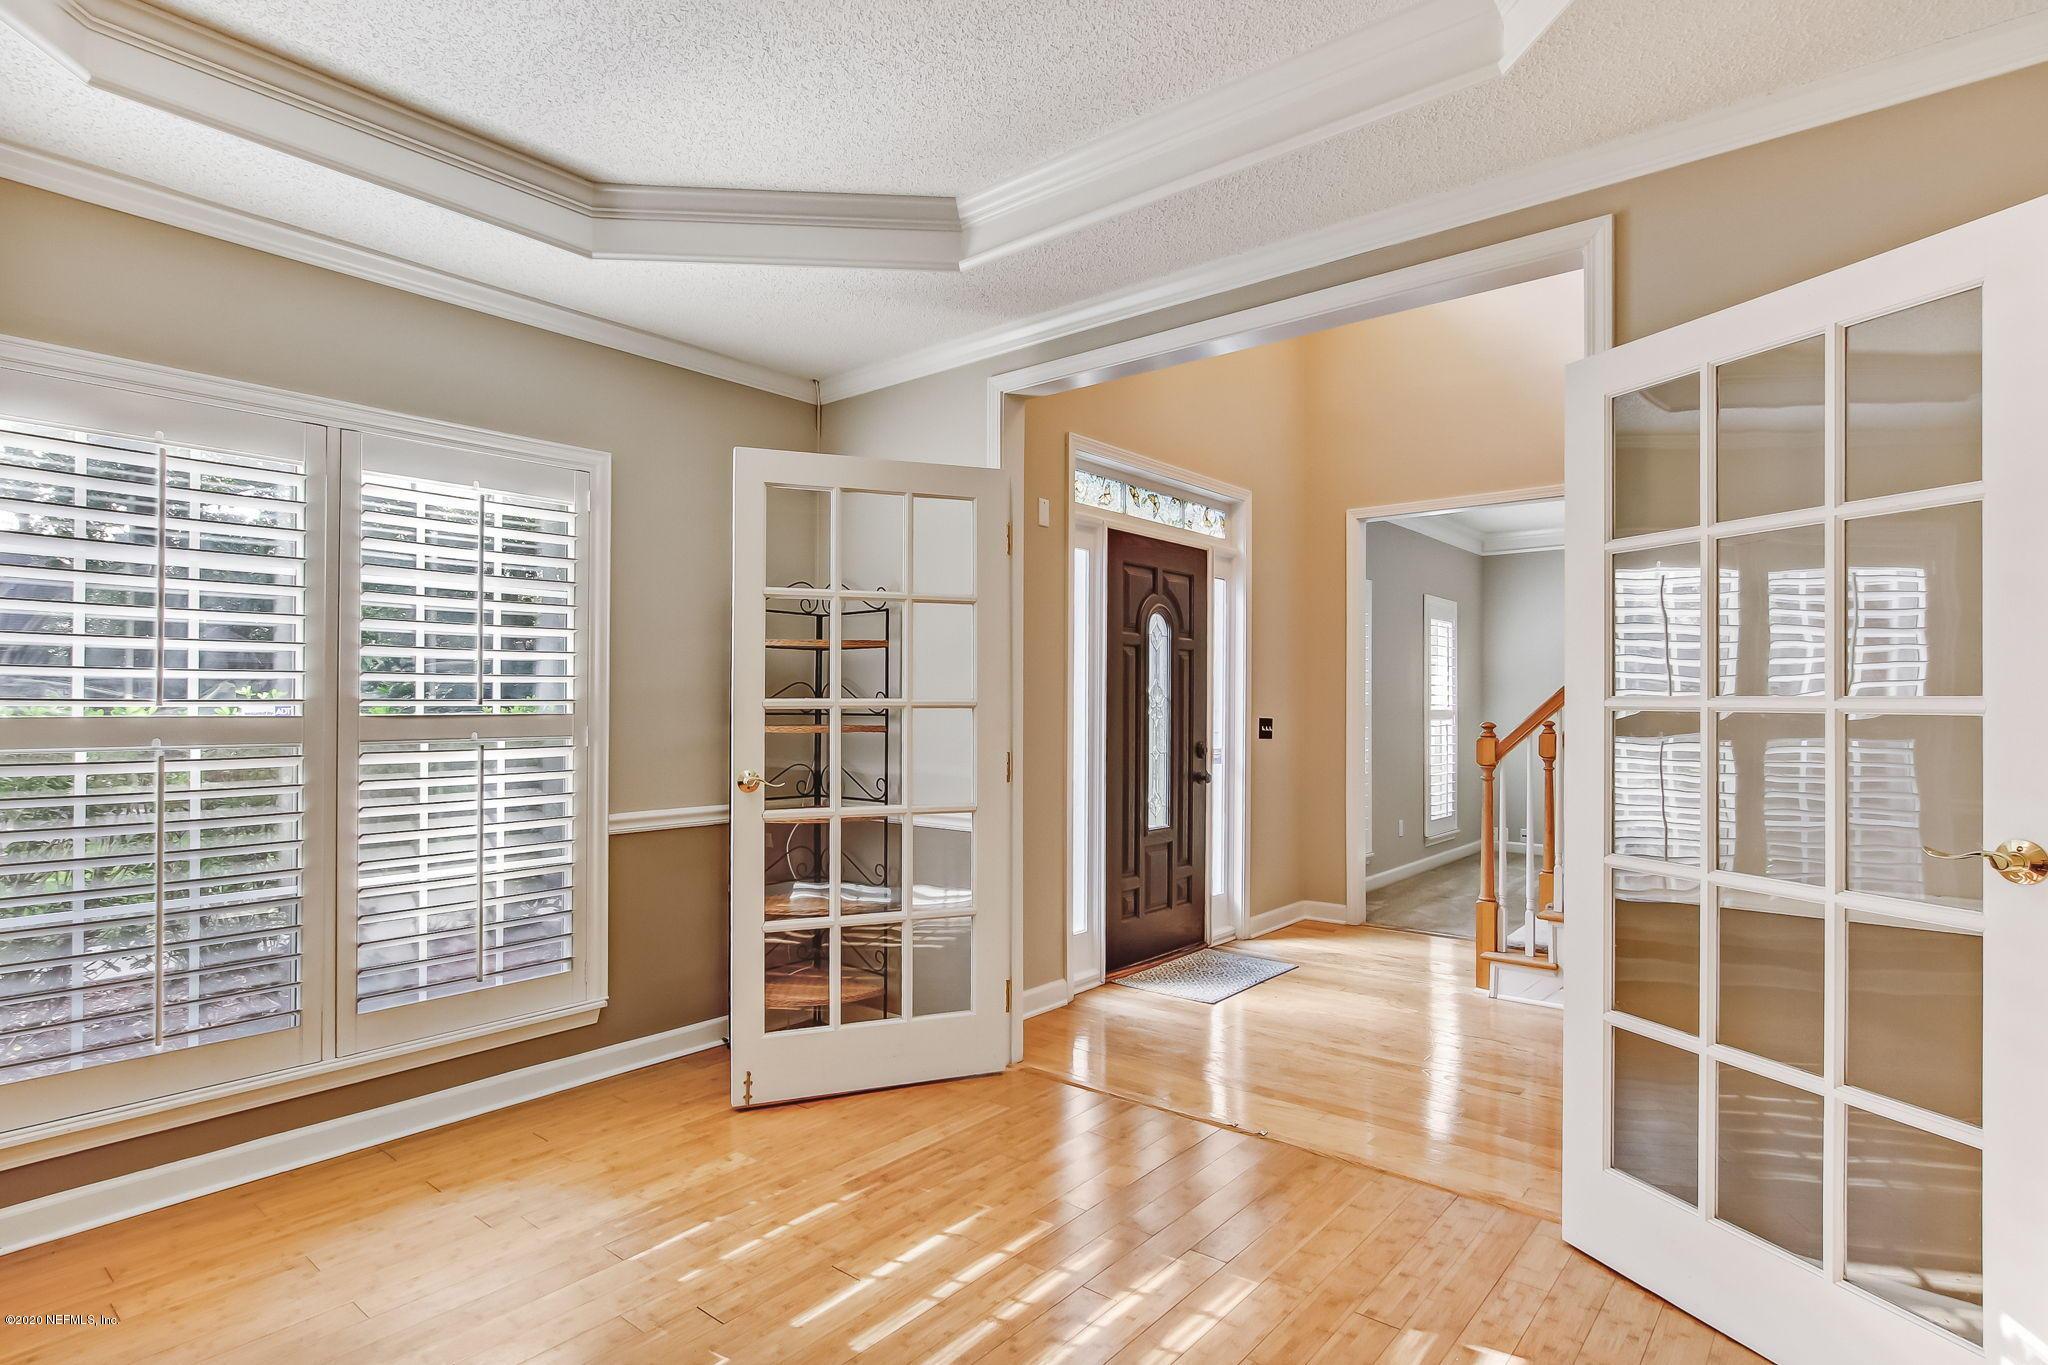 11825 CLEARWATER OAKS, JACKSONVILLE, FLORIDA 32223, 4 Bedrooms Bedrooms, ,2 BathroomsBathrooms,Residential,For sale,CLEARWATER OAKS,1081672